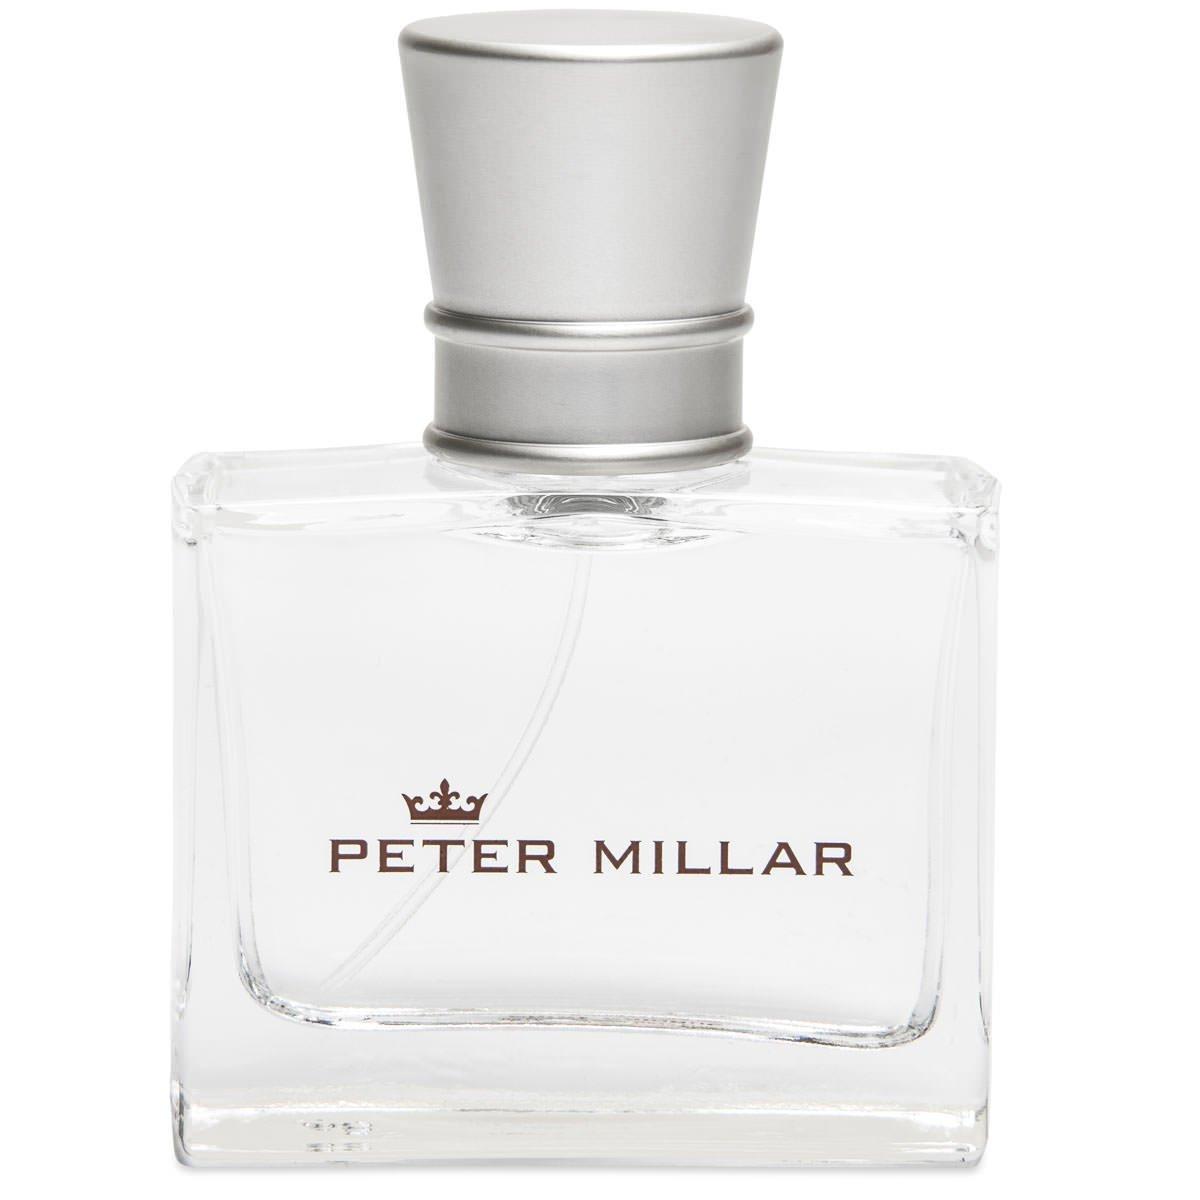 Peter Millar Cologne